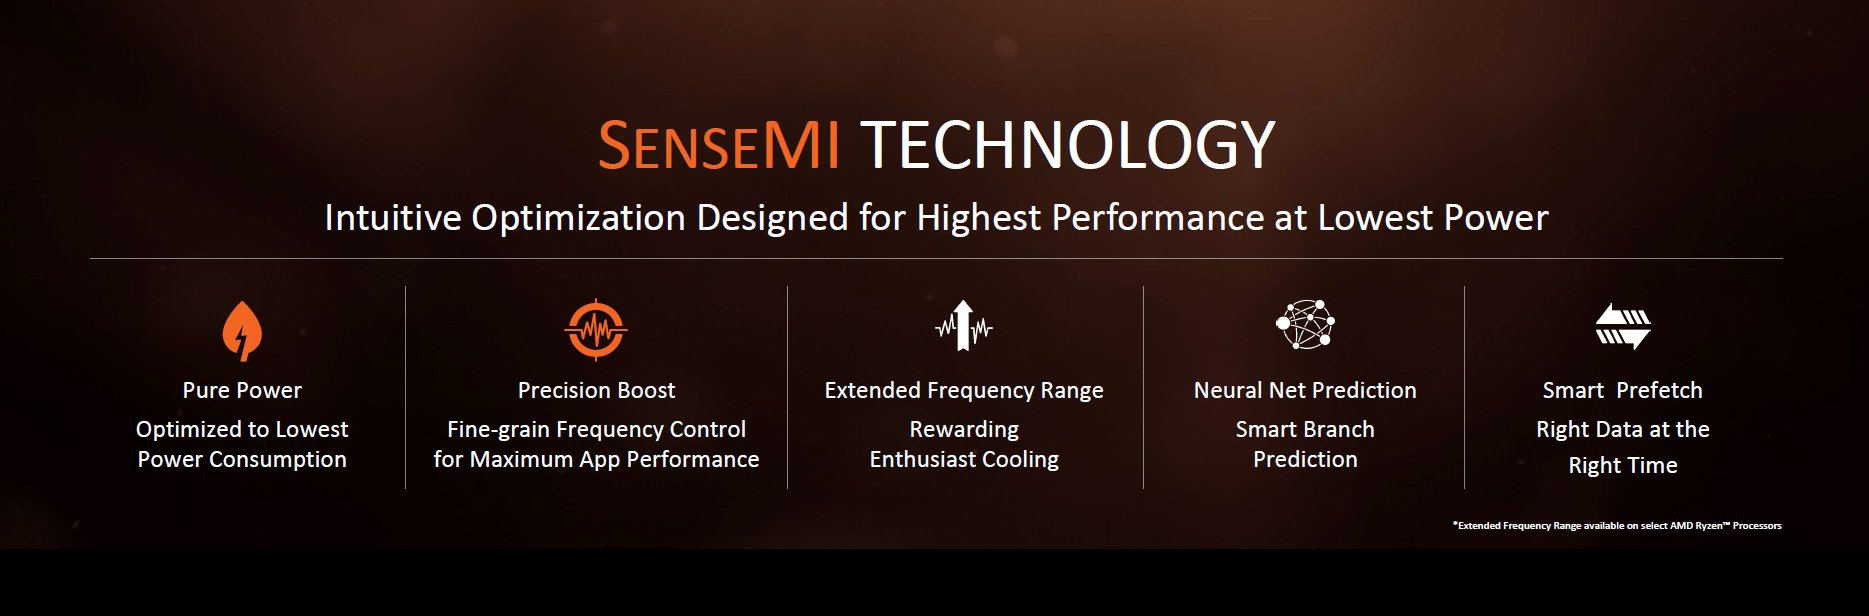 AMD Ryzen 7 Sense MI Technology Features